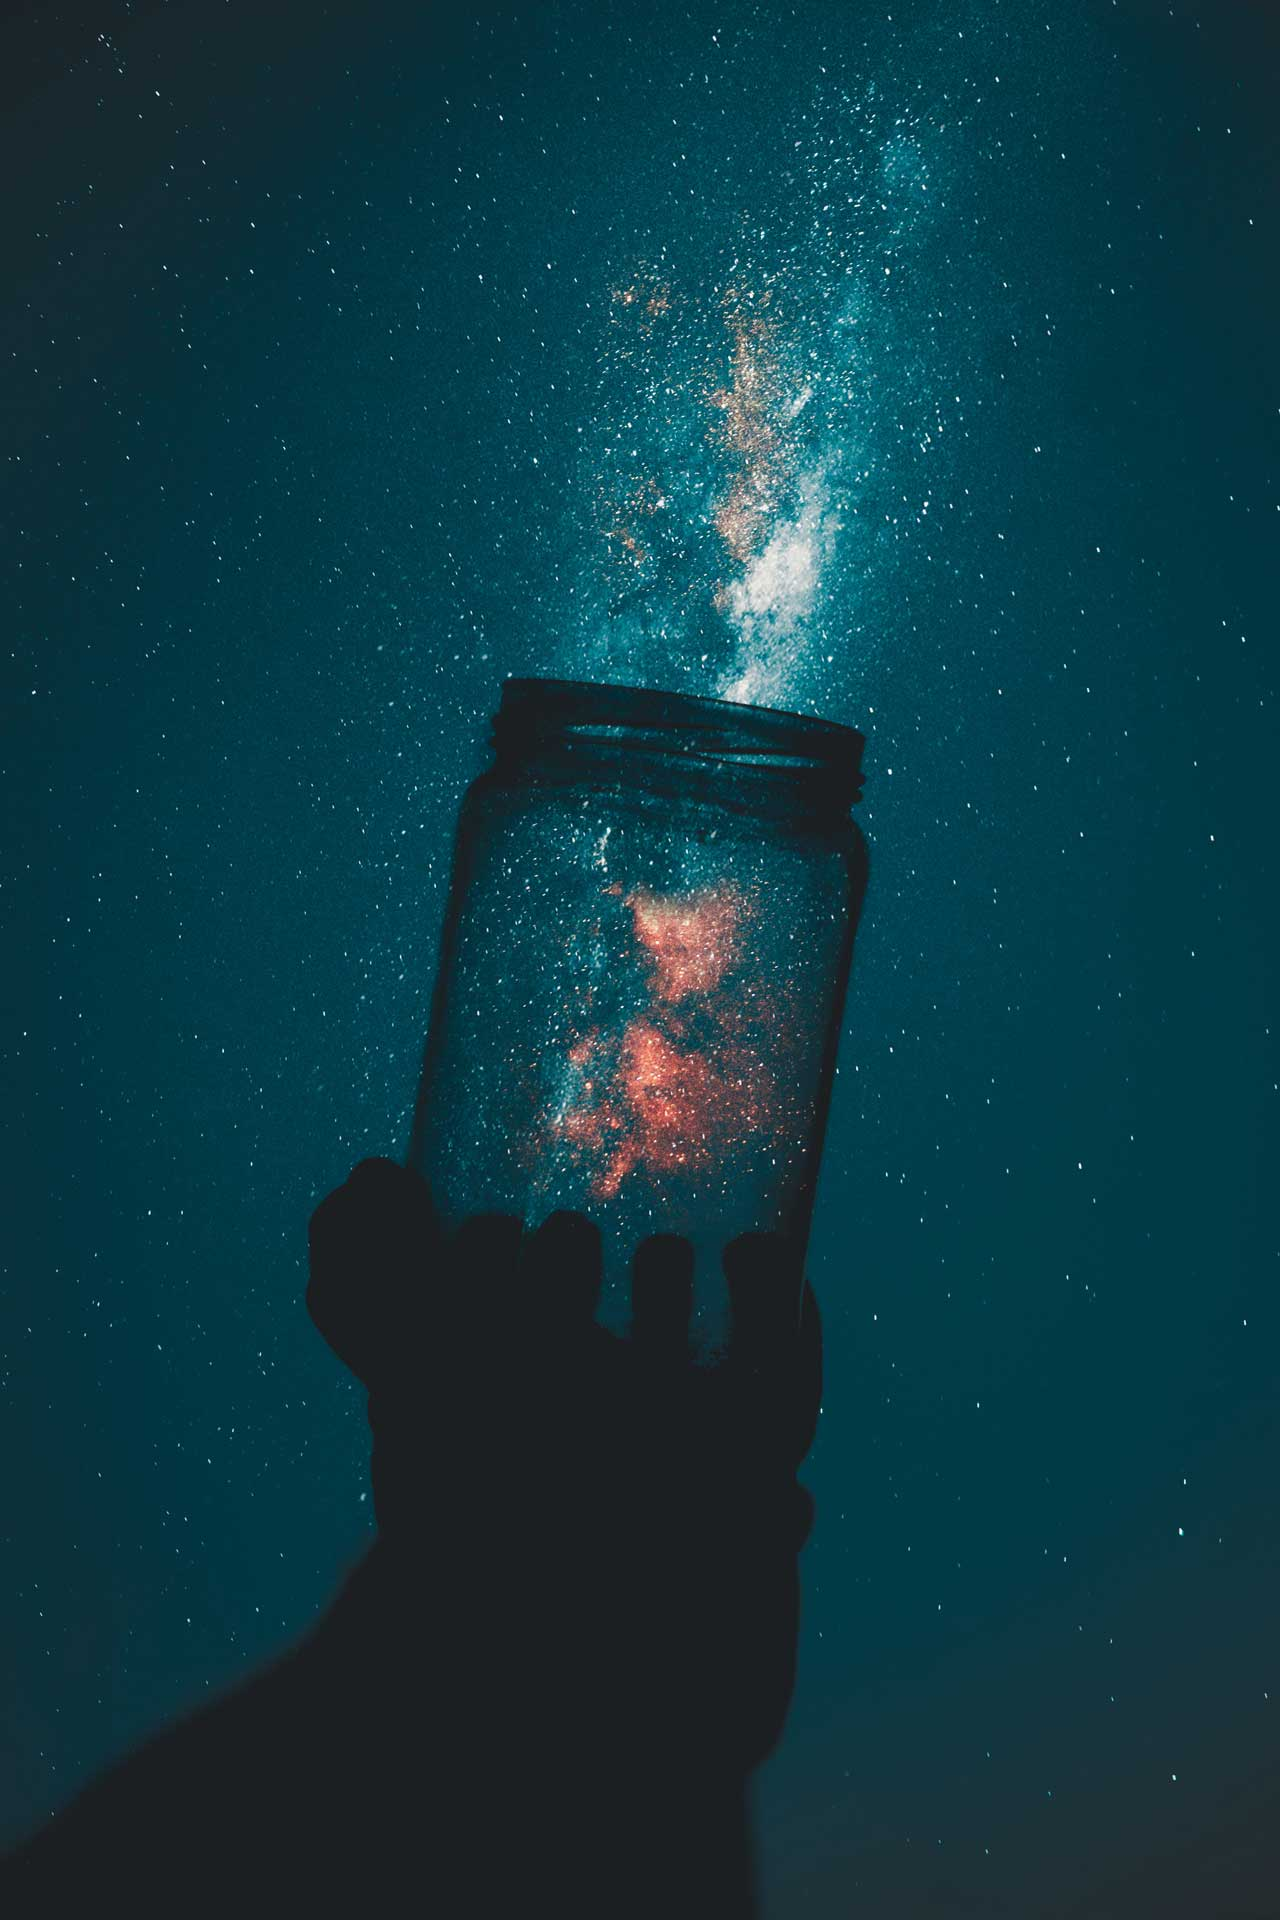 foto di Rakicevic Nenad da <a href='https://www.pexels.com/it-it/foto/astronomia-azione-cielo-cielo-notturno-1274260/' target='_blank'>Pexels</a>